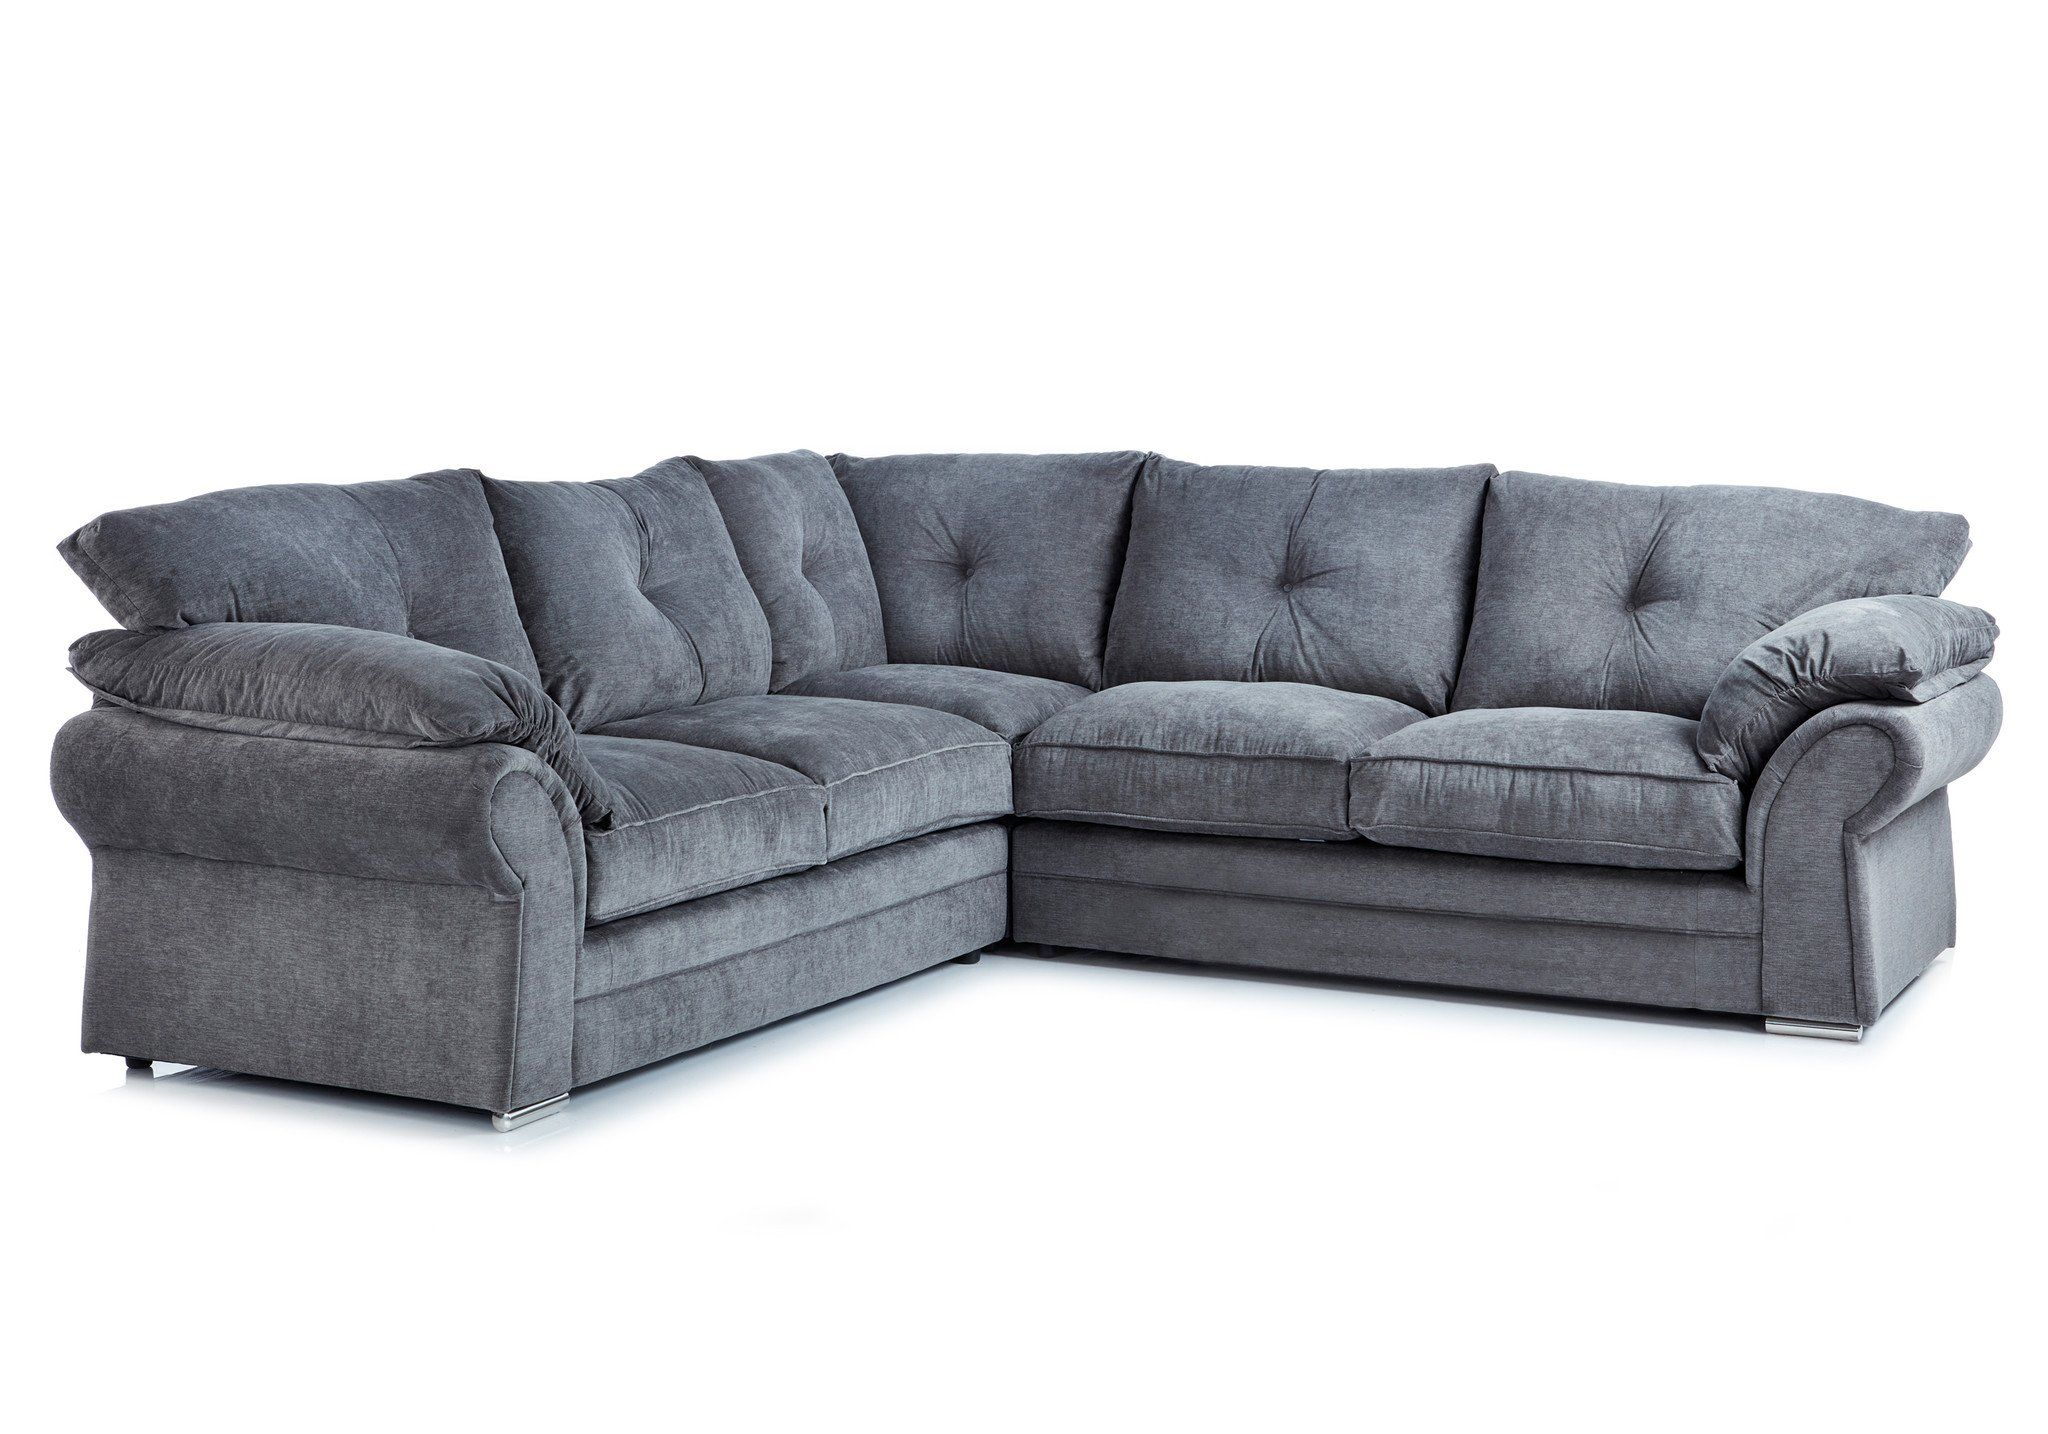 Beckenham Furniture4u Cheap Sofas Cheap Sofas Corner Sofa Sofas